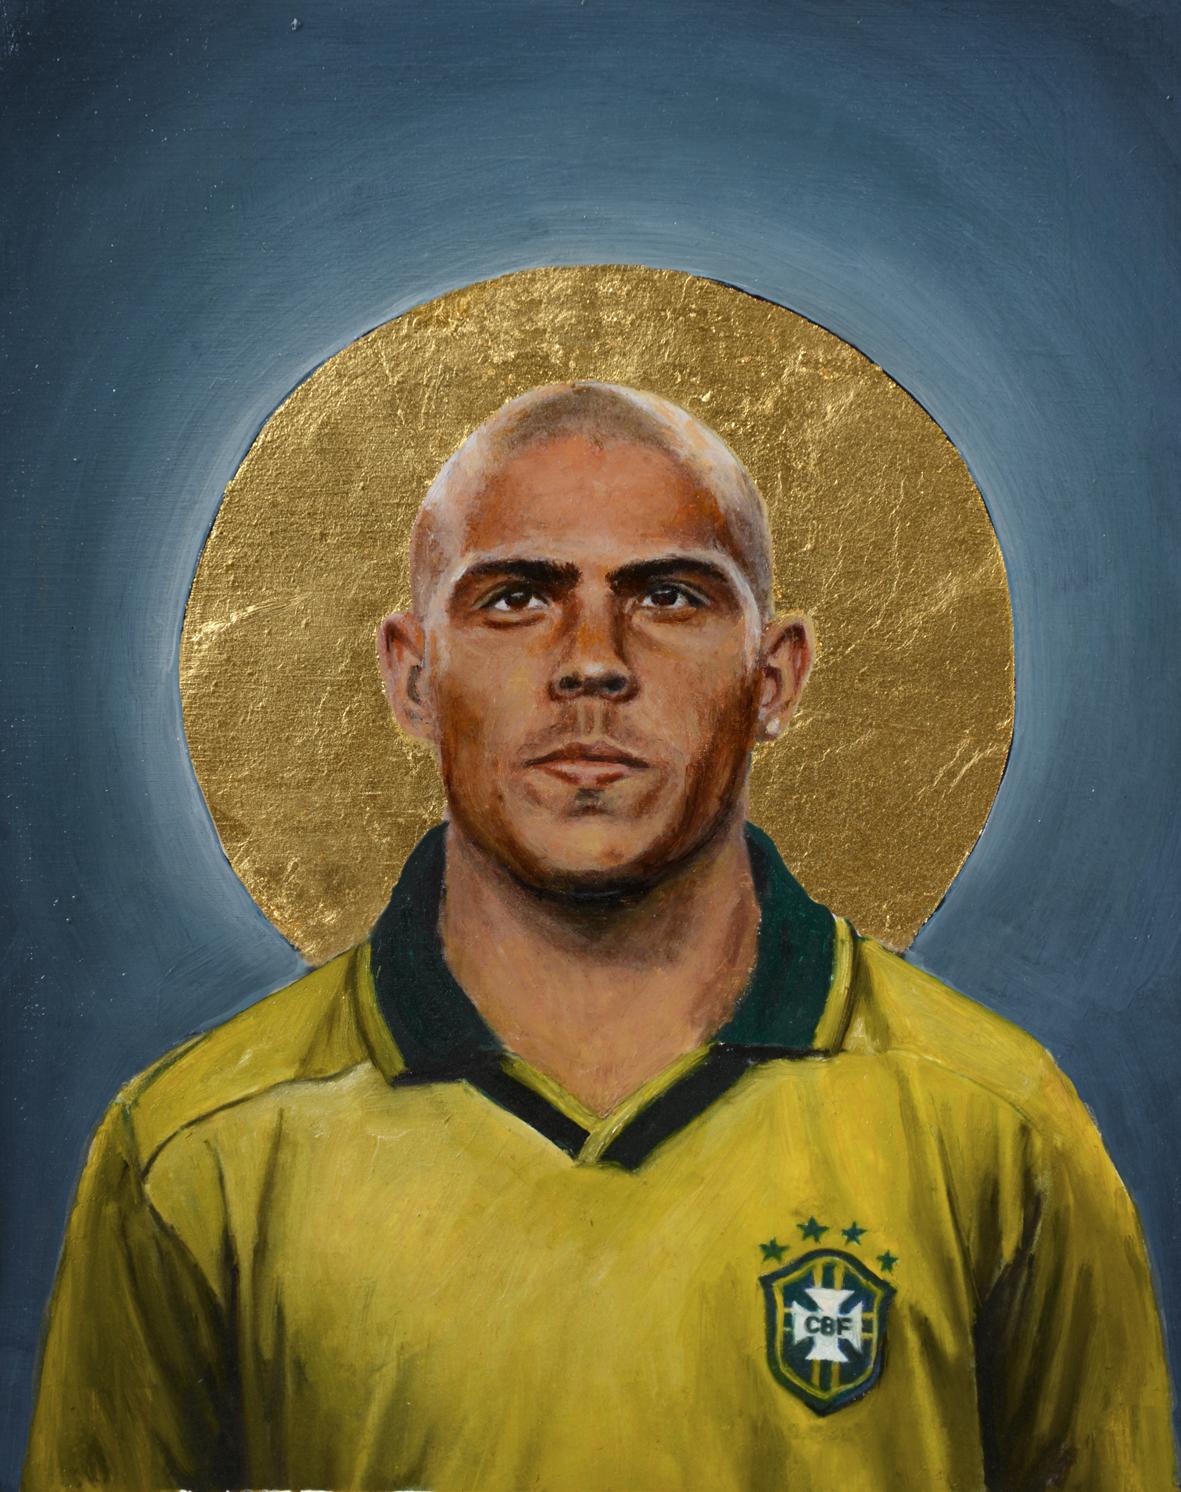 Ronaldo_BRASIL_DEF.jpg